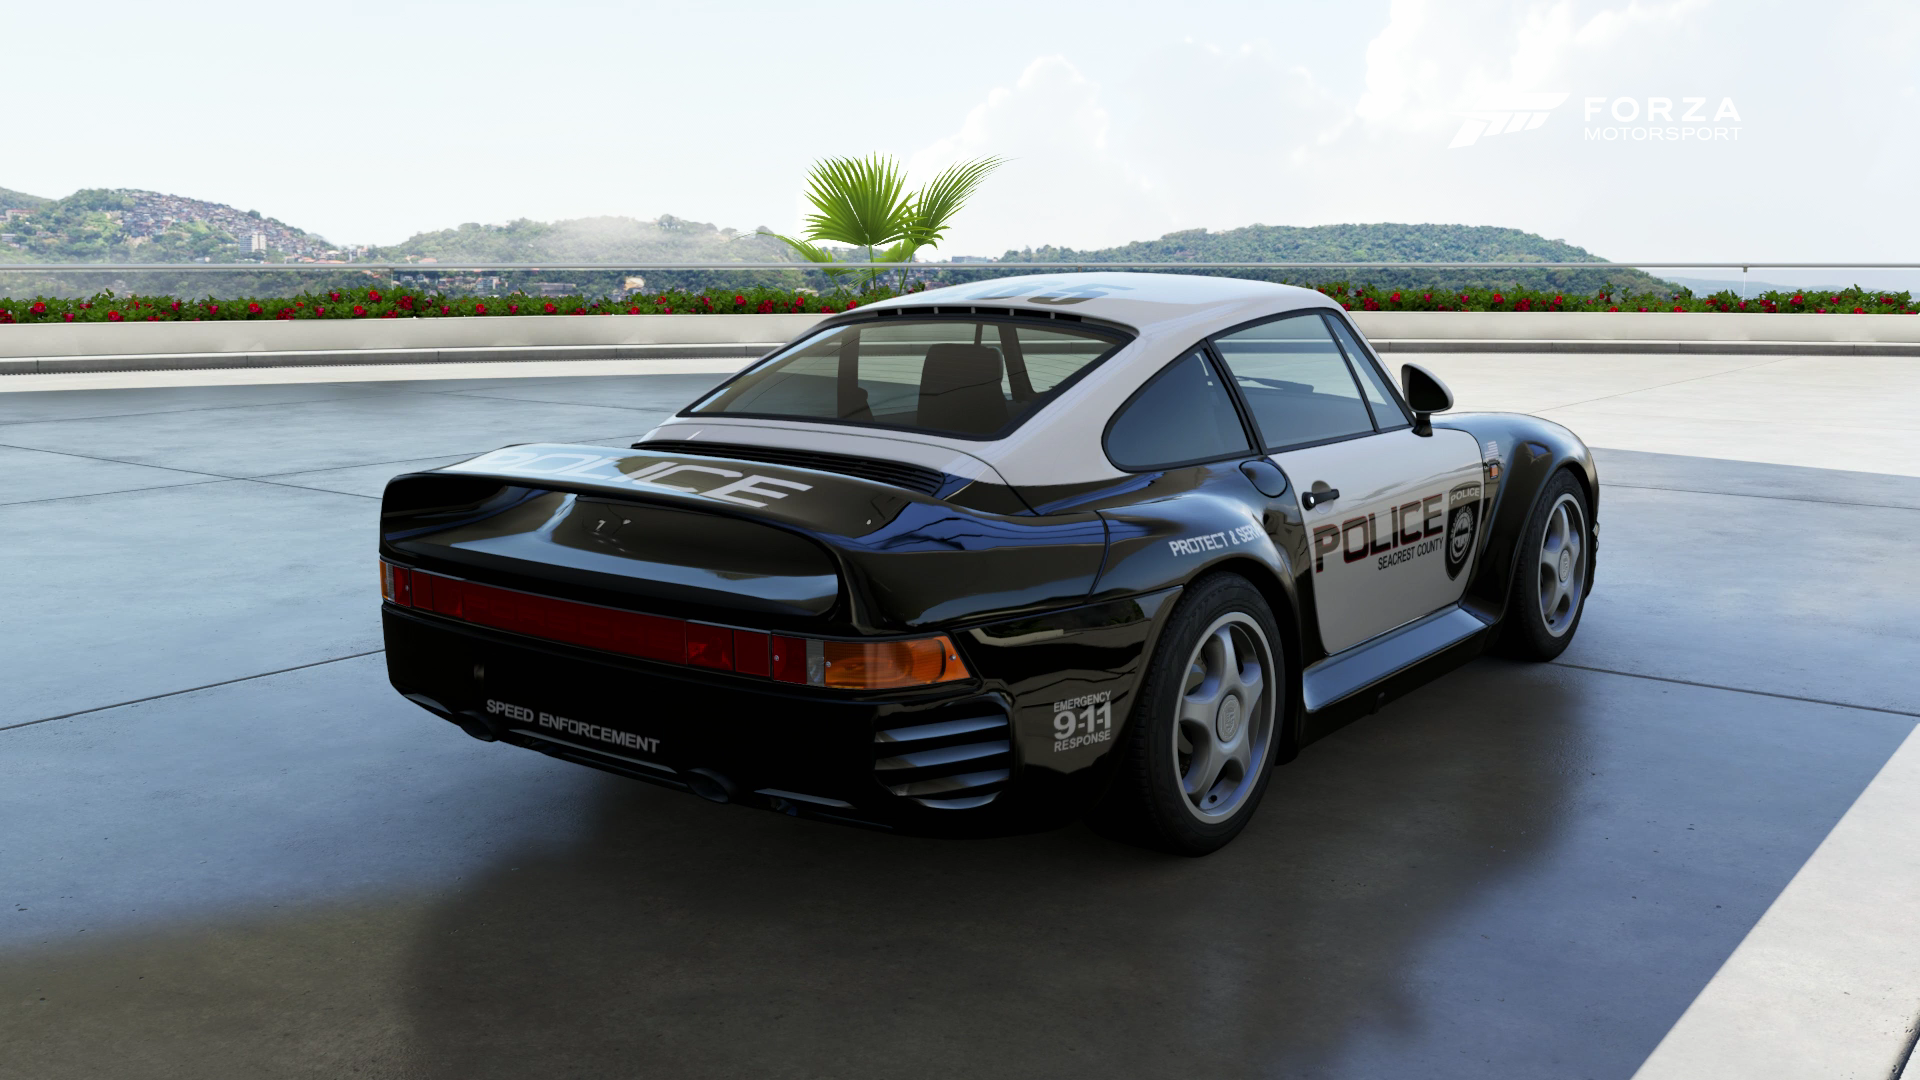 scpd___1987_porsche_959___back_by_xboxgamer969-d9uq1w9 Mesmerizing Porsche 918 Spyder London Ontario Cars Trend